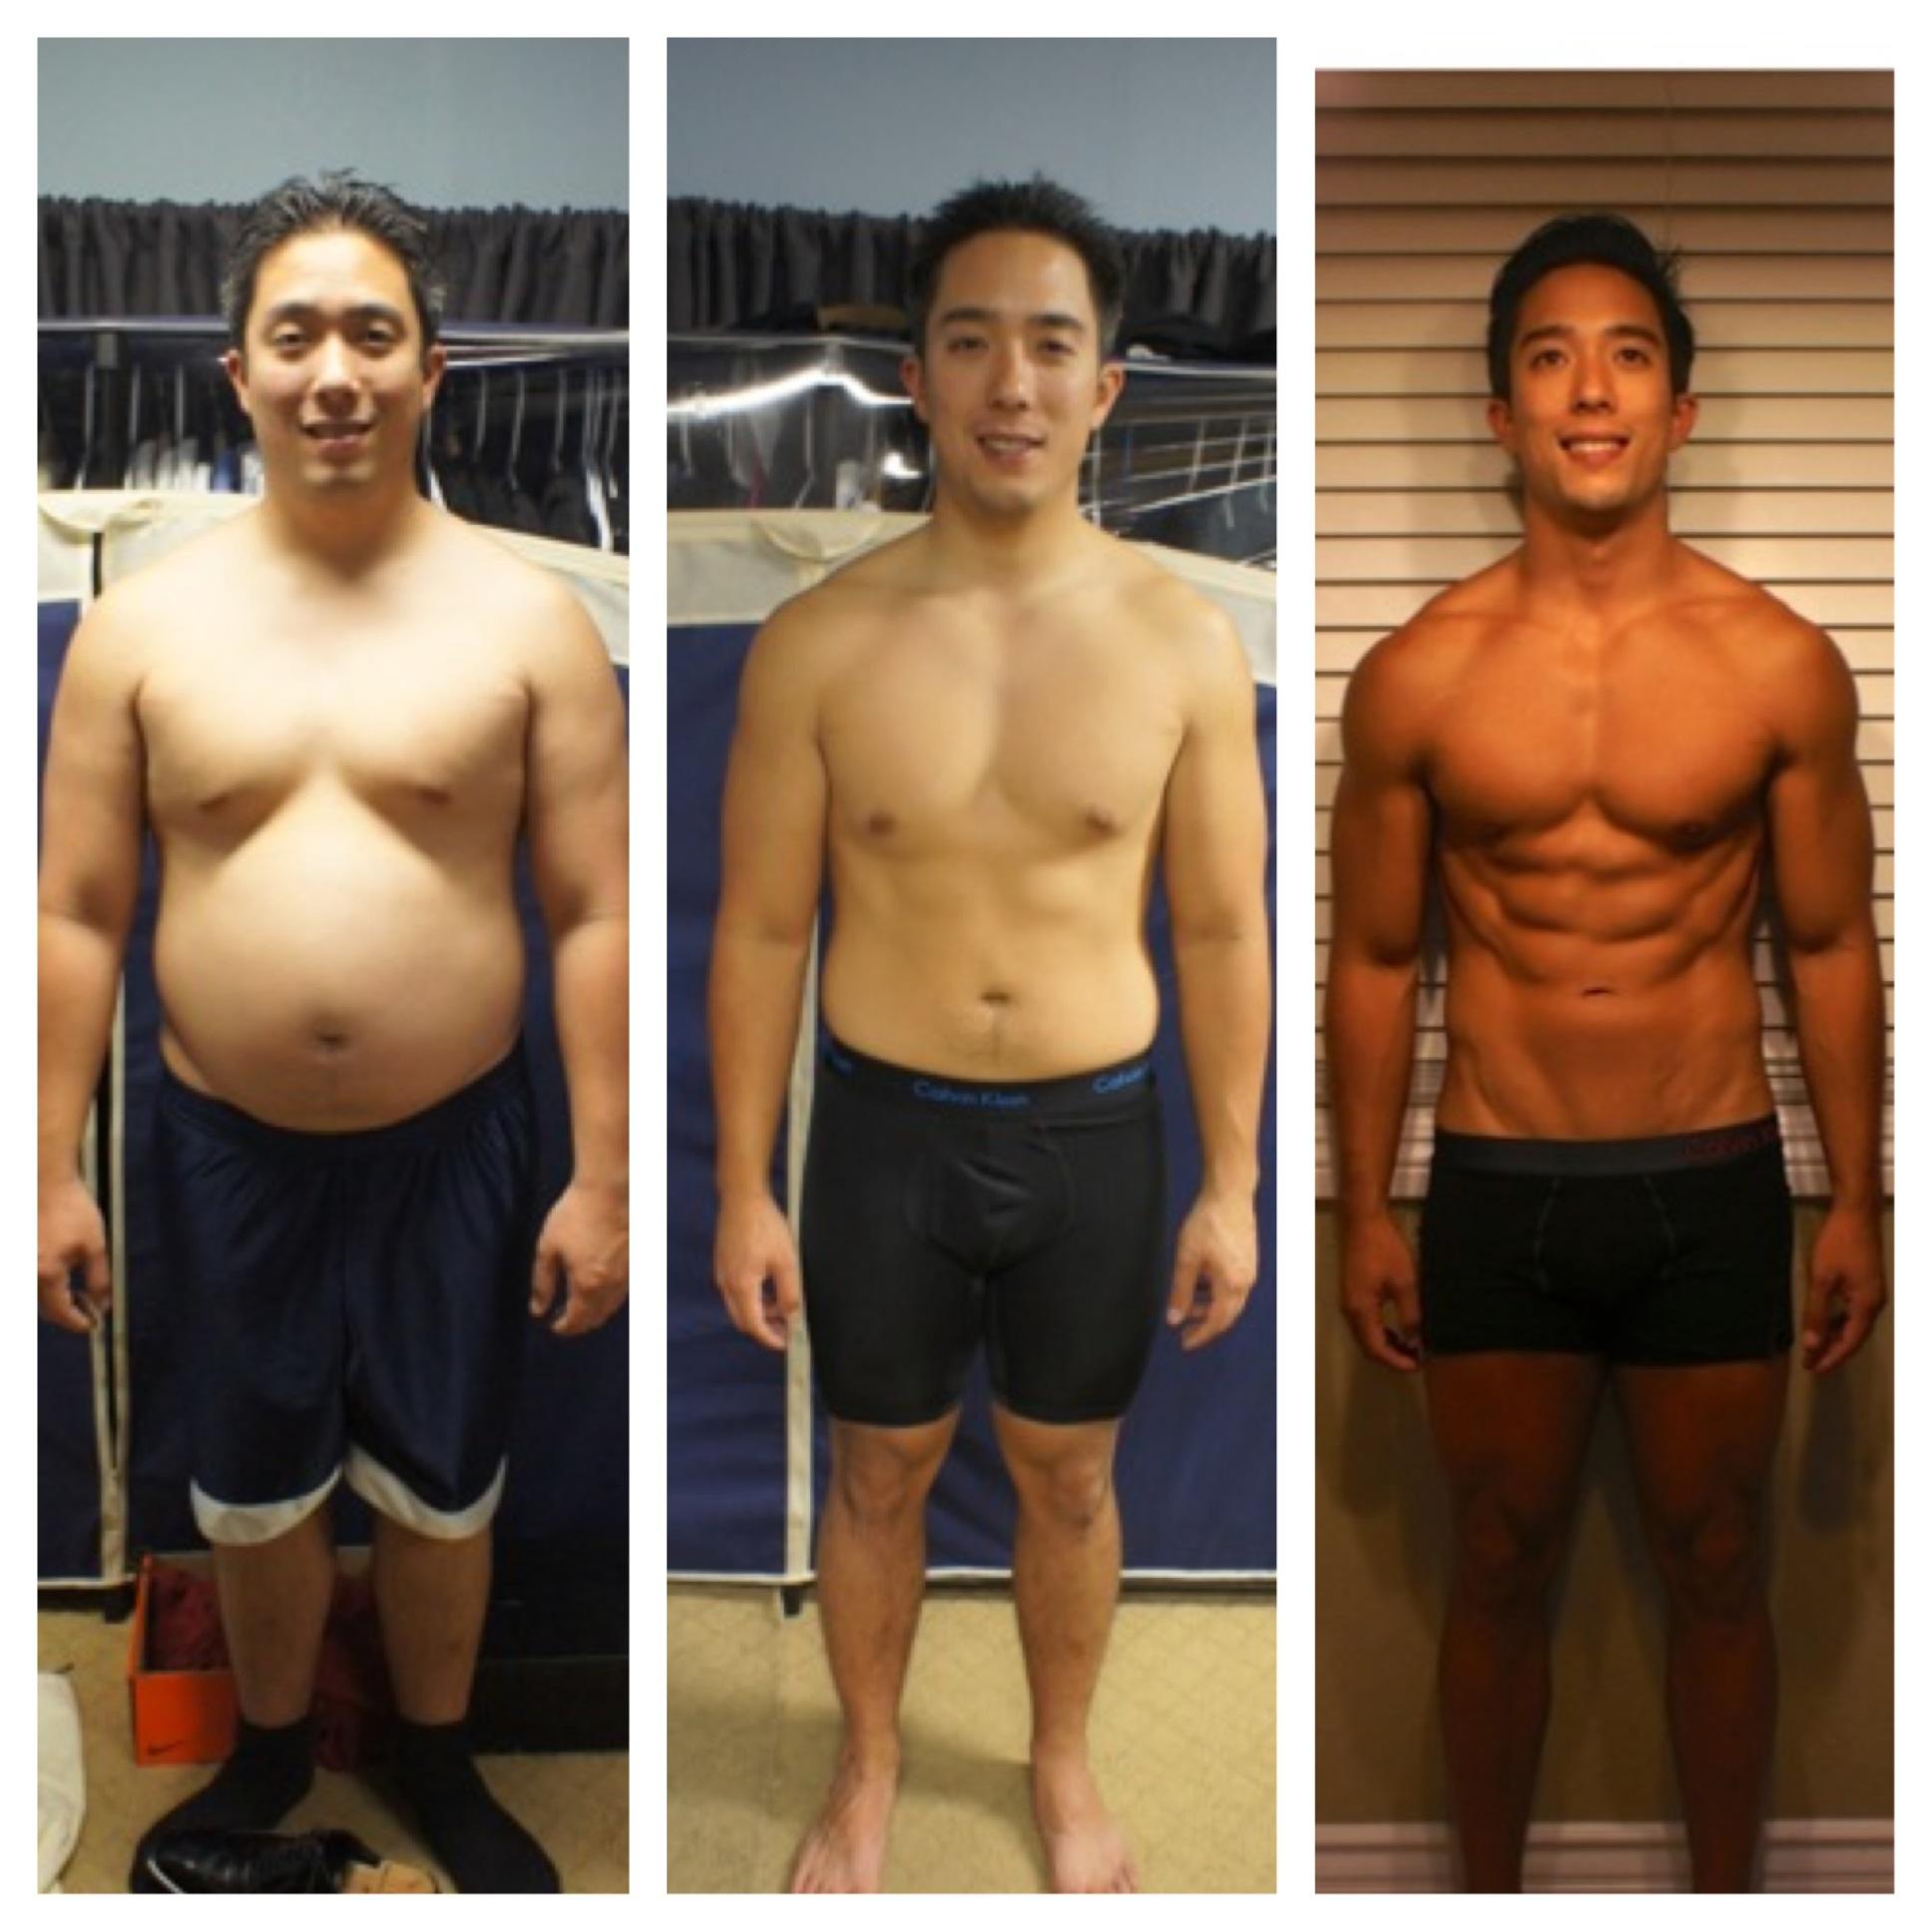 Crossfit body transformation